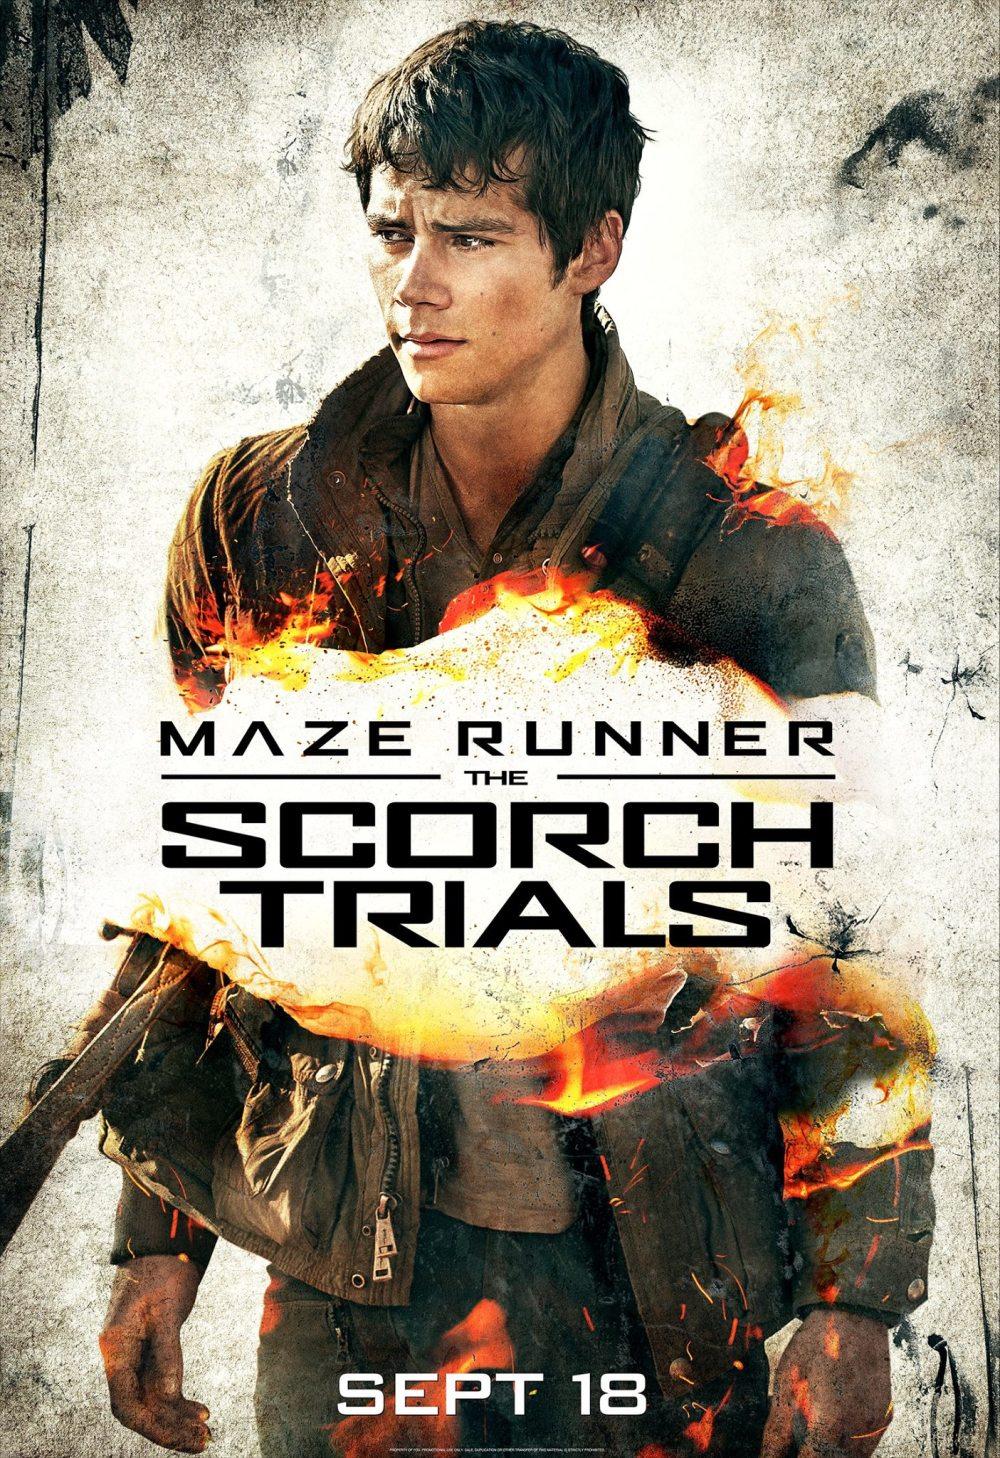 Dylan O'Brien op nieuwe poster 'Maze Runner: The Scorch Trials'